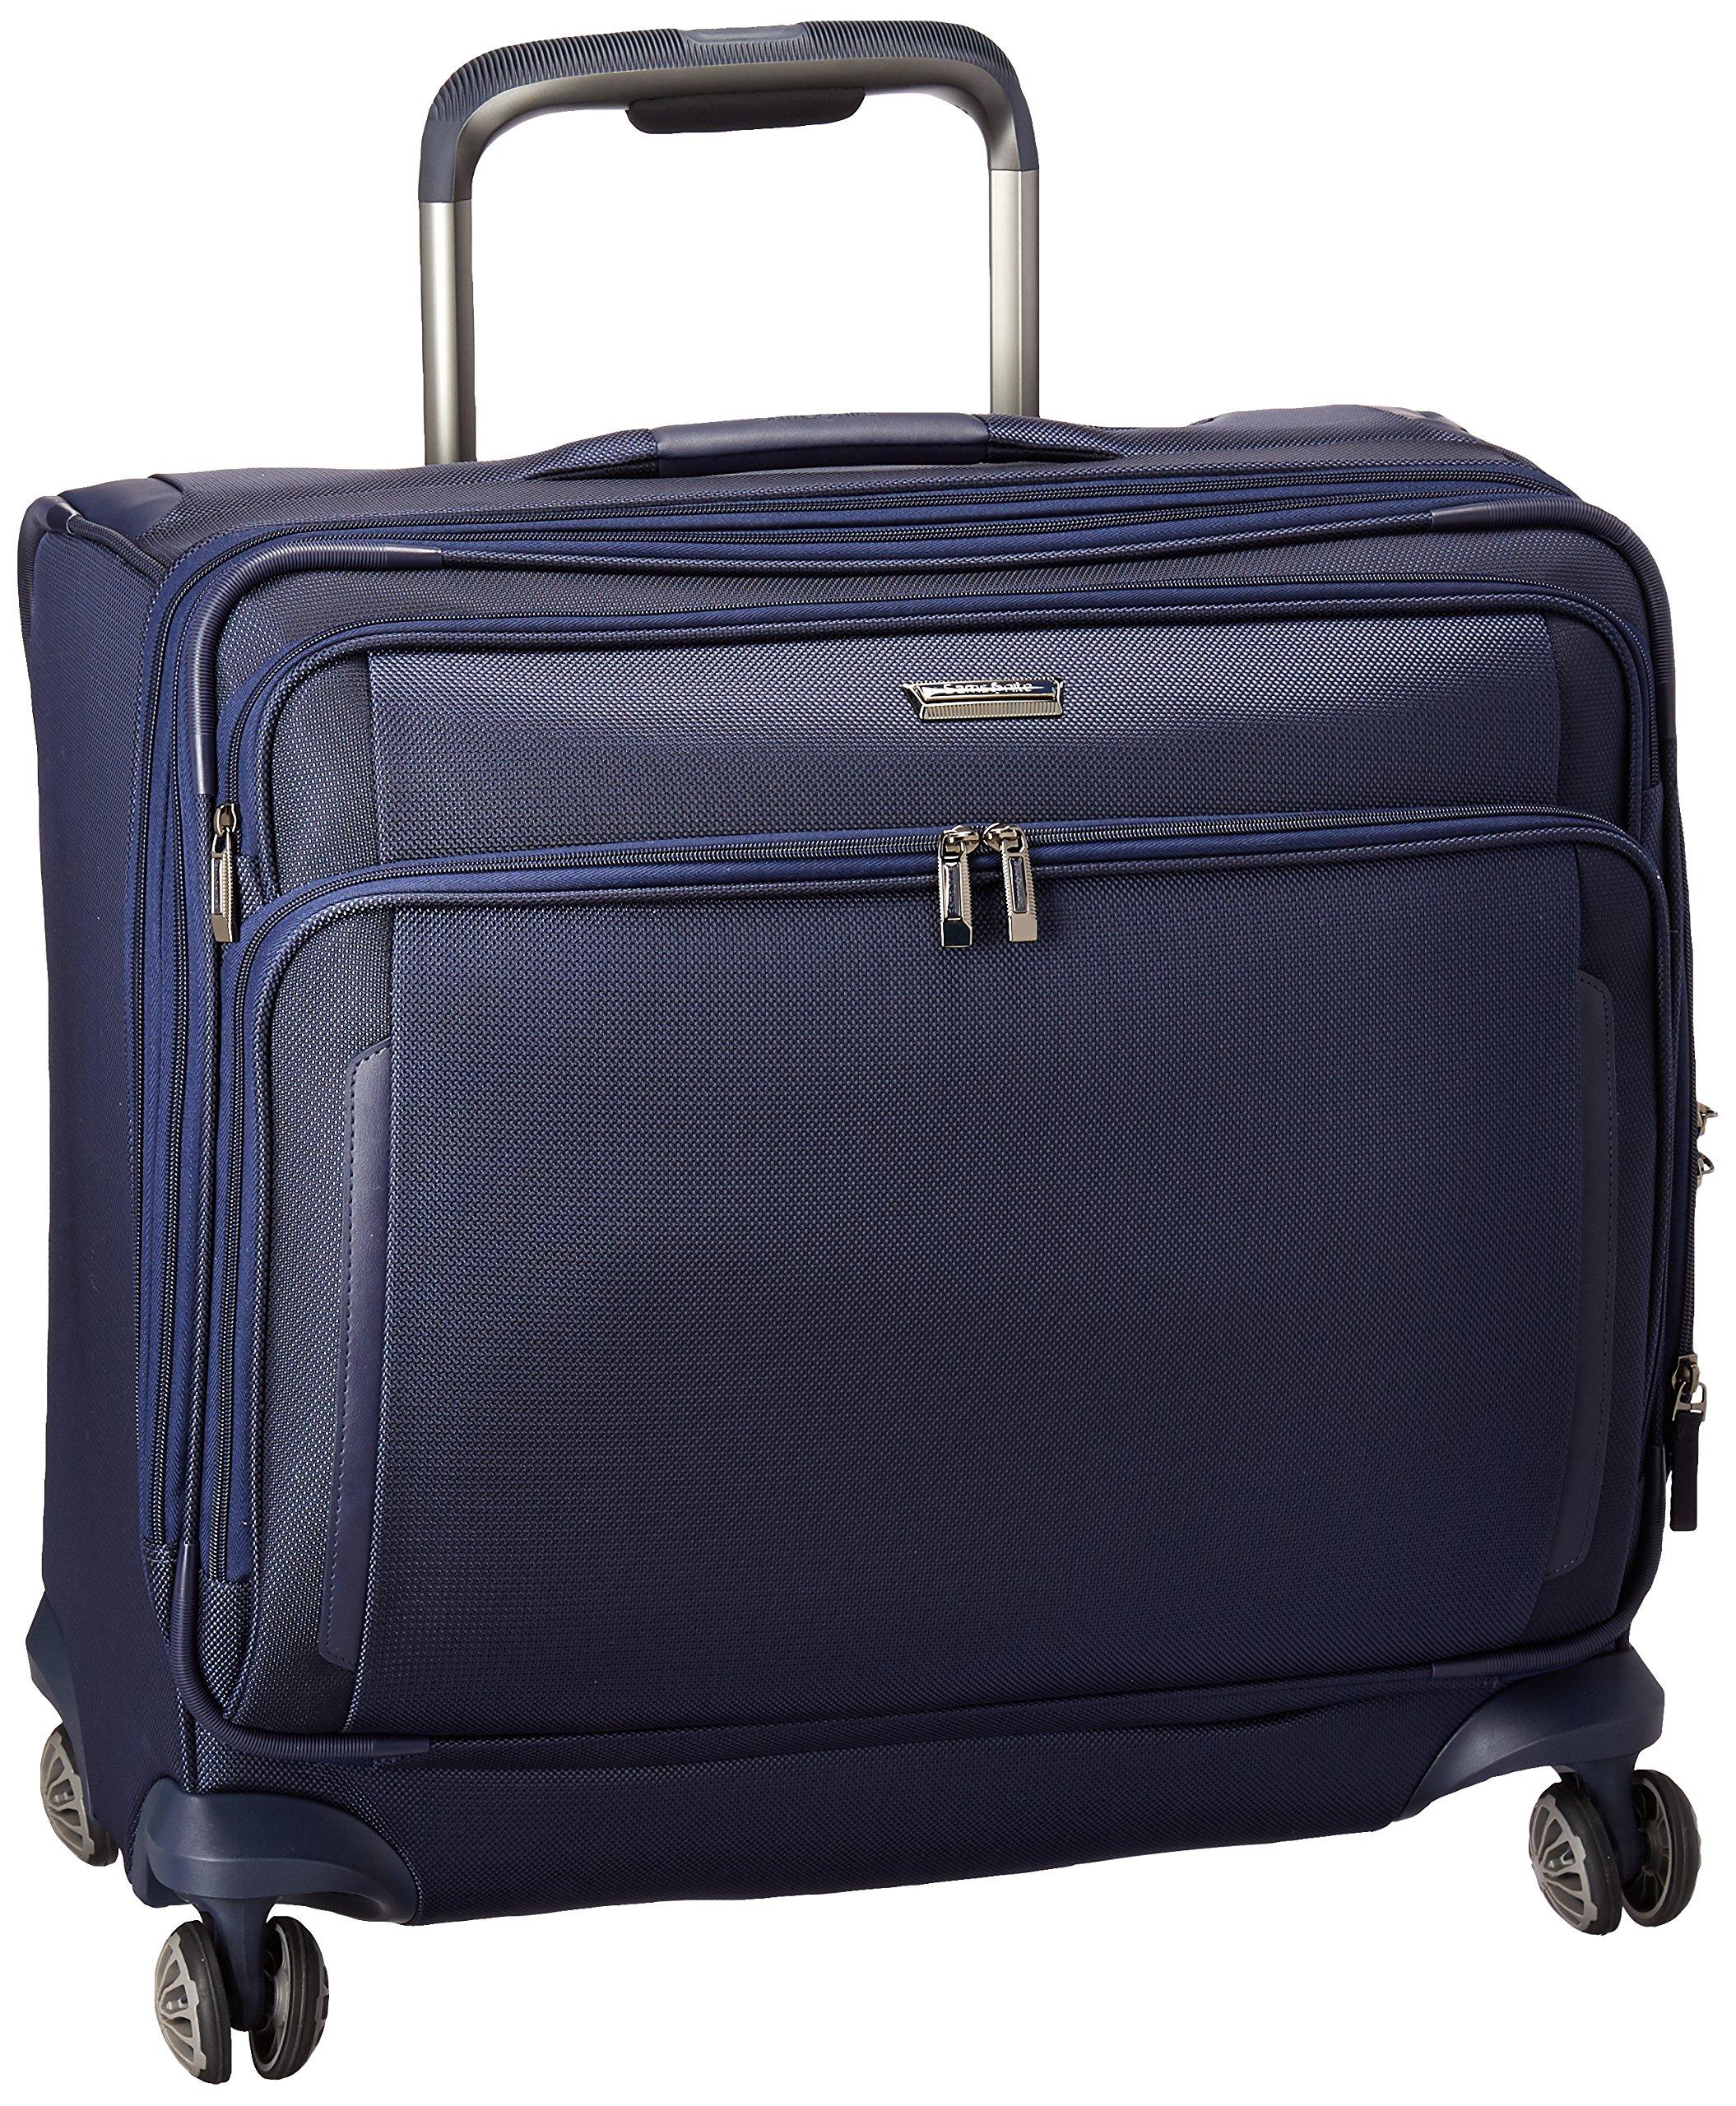 Samsonite Silhouette Xv Softside Medium Glider Case, Twilight Blue